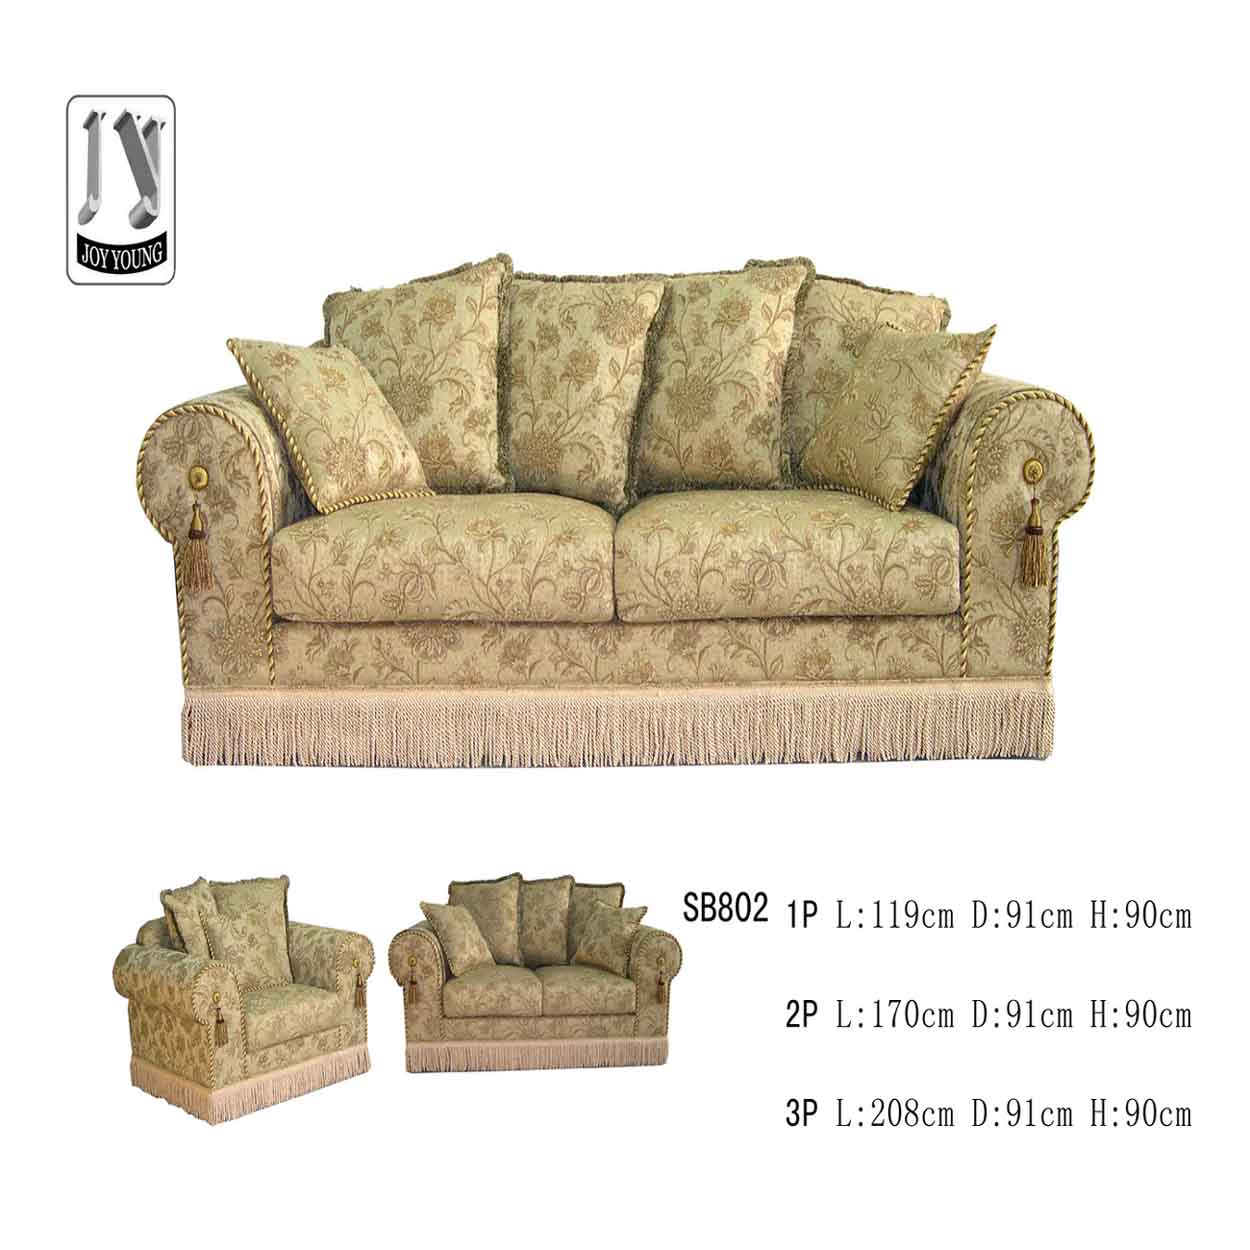 Charmant Elegant Fabric Sofa (Элегантные ткани Диван) · Zoom In